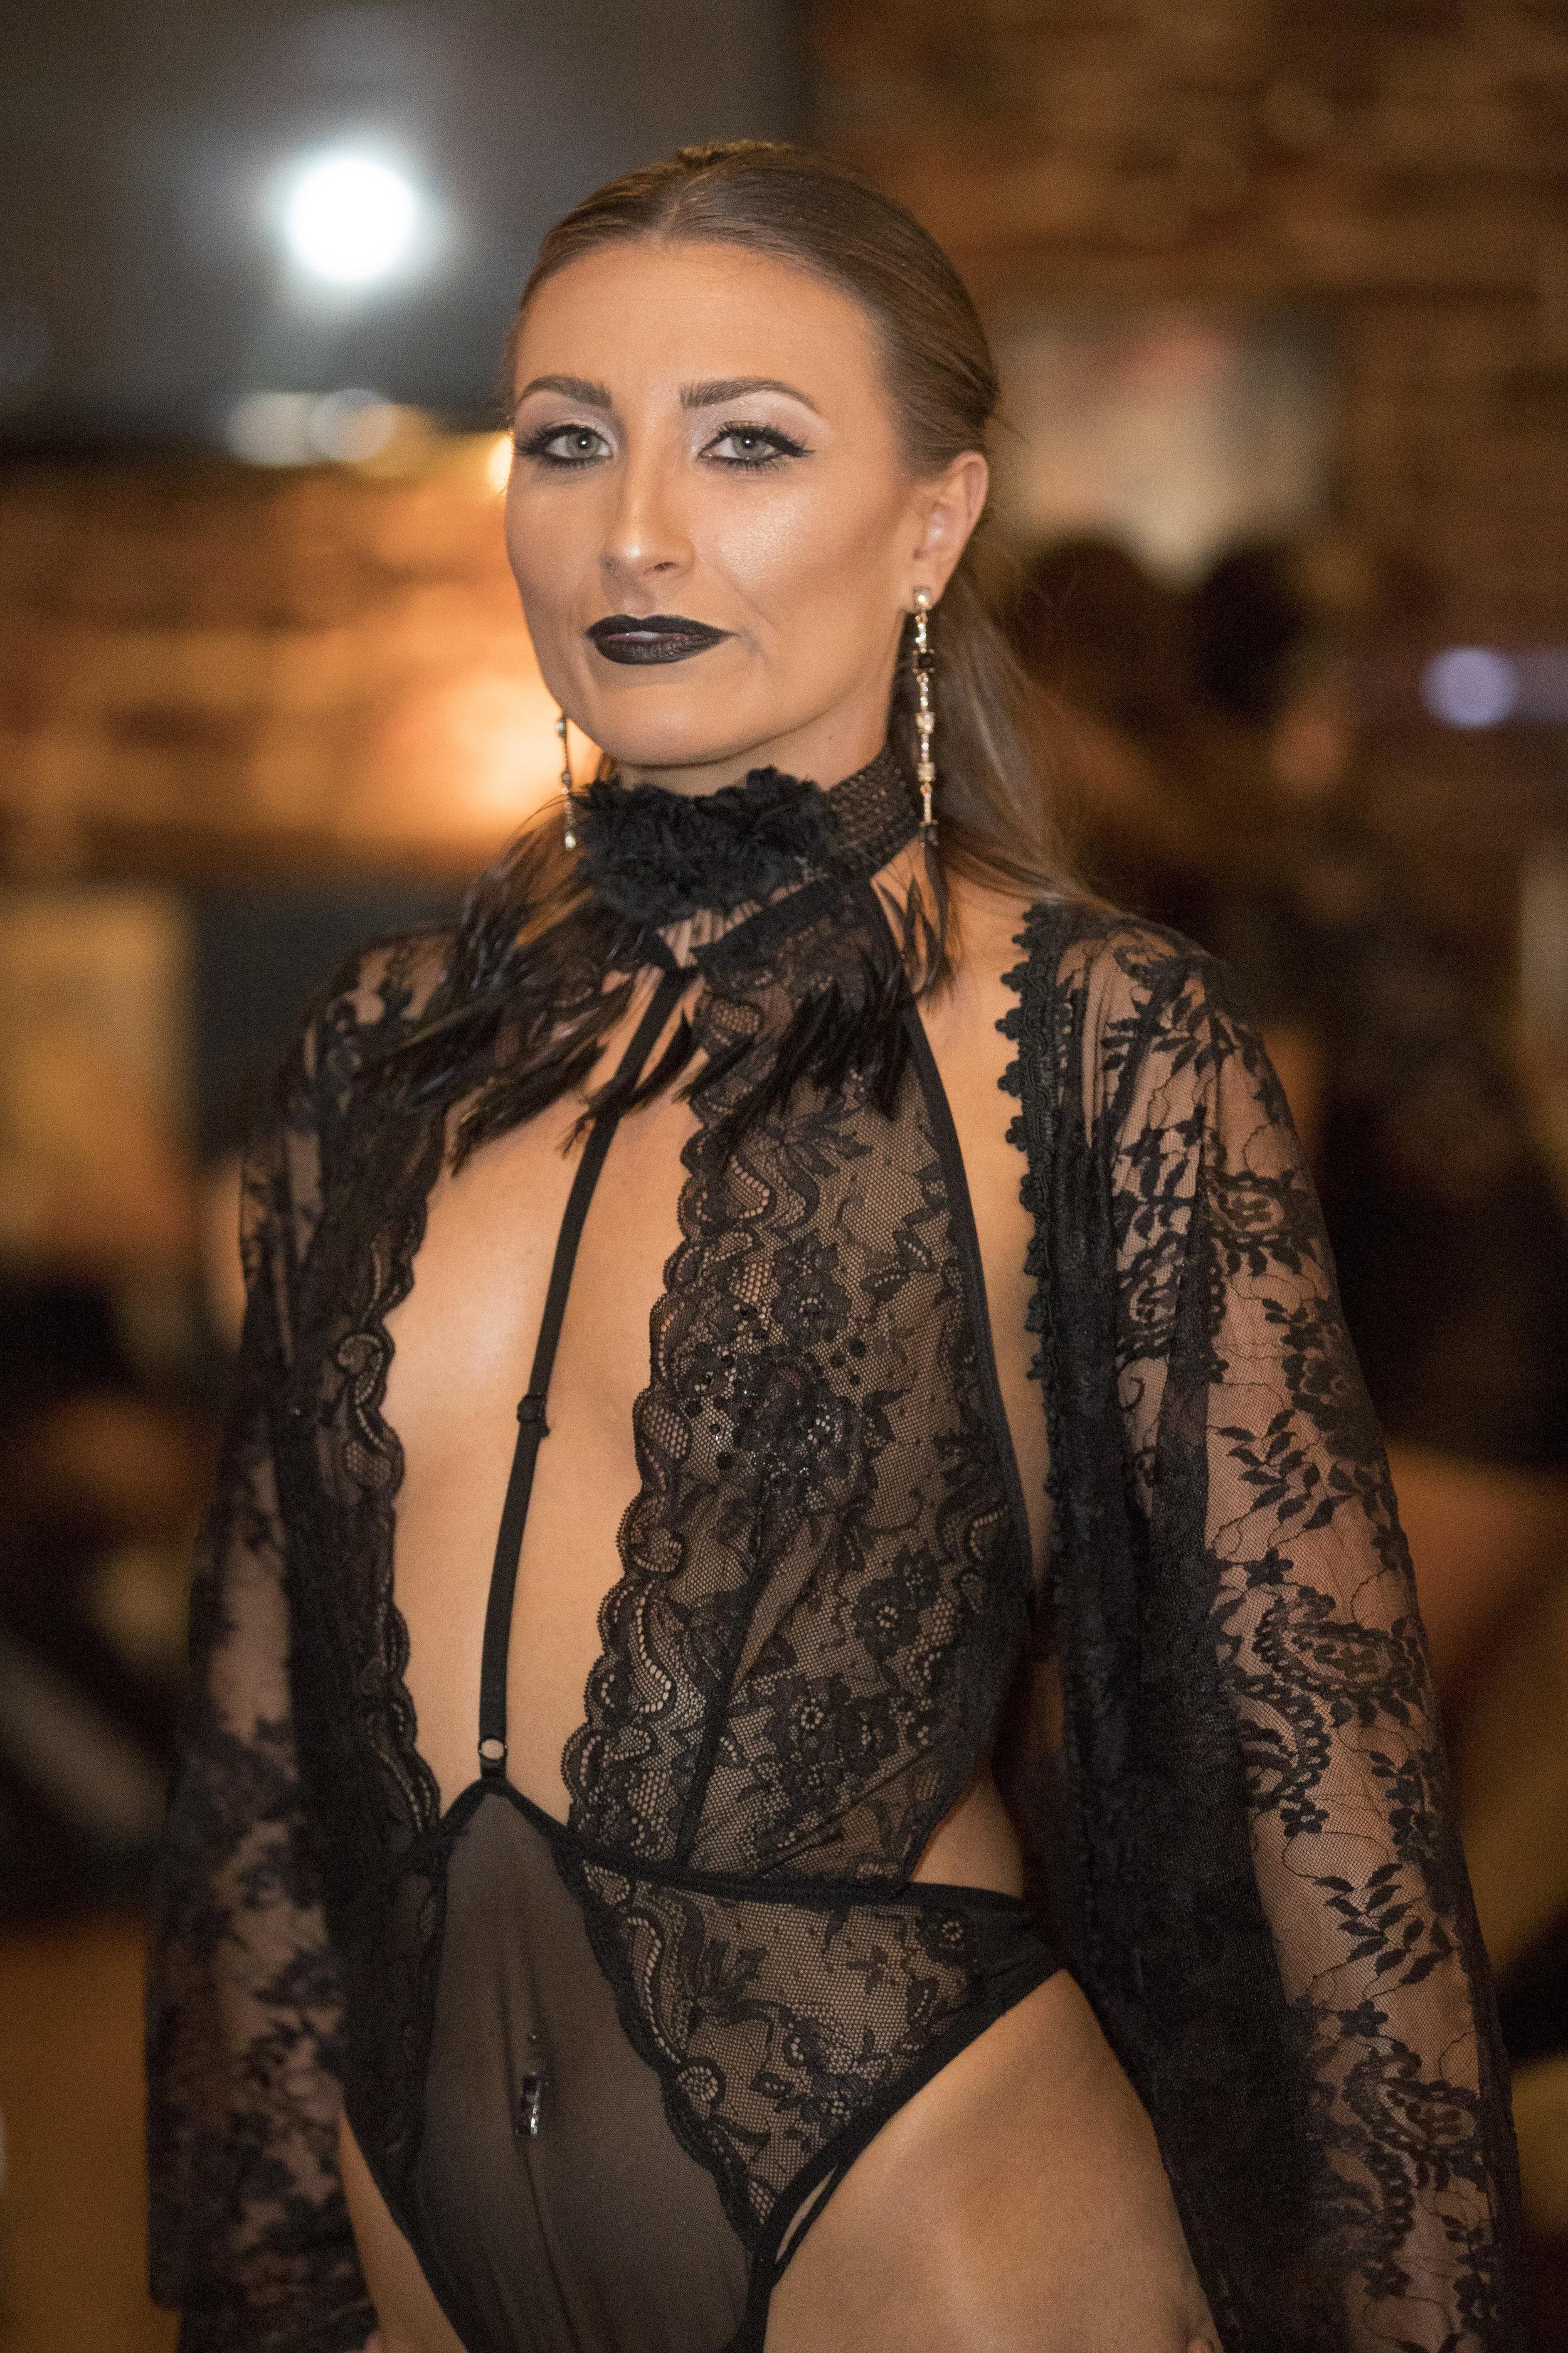 RAW SAVOR - Femme Fatele Backstage - 014.jpg